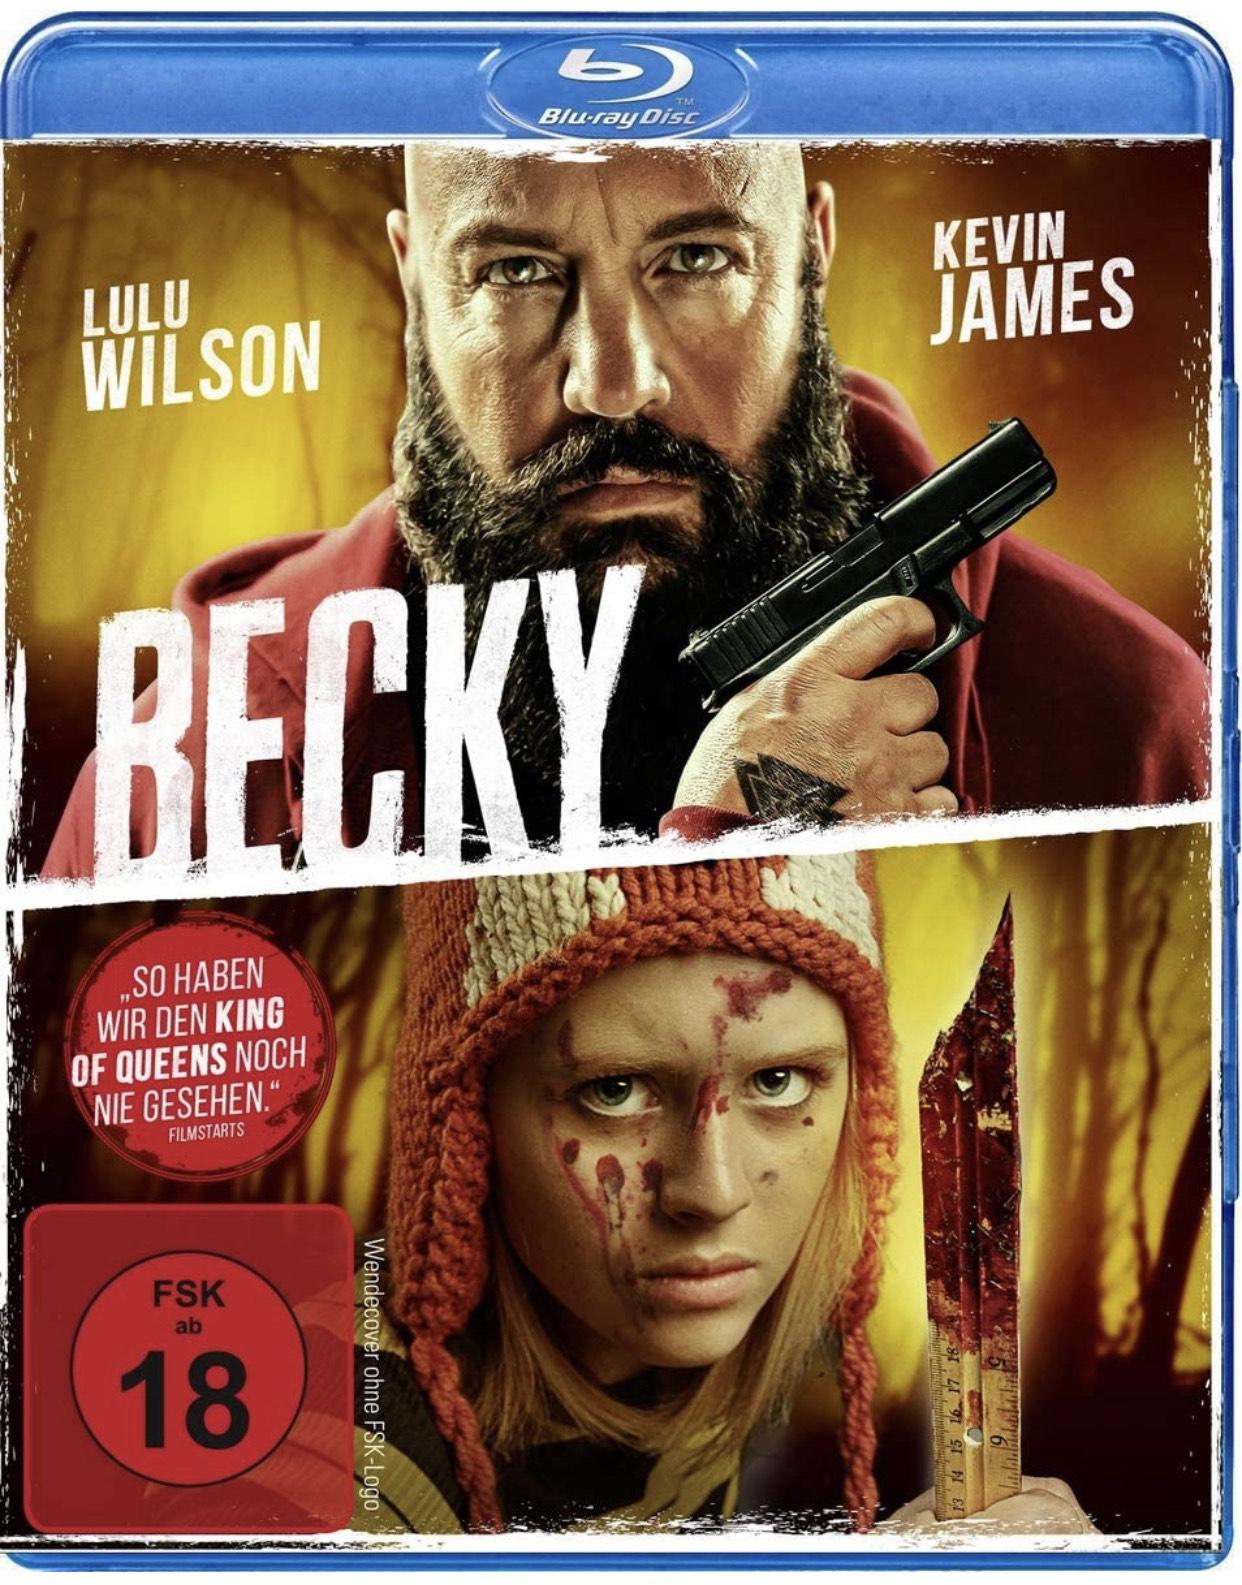 2 x Becky (Blu-ray) bei Amazon